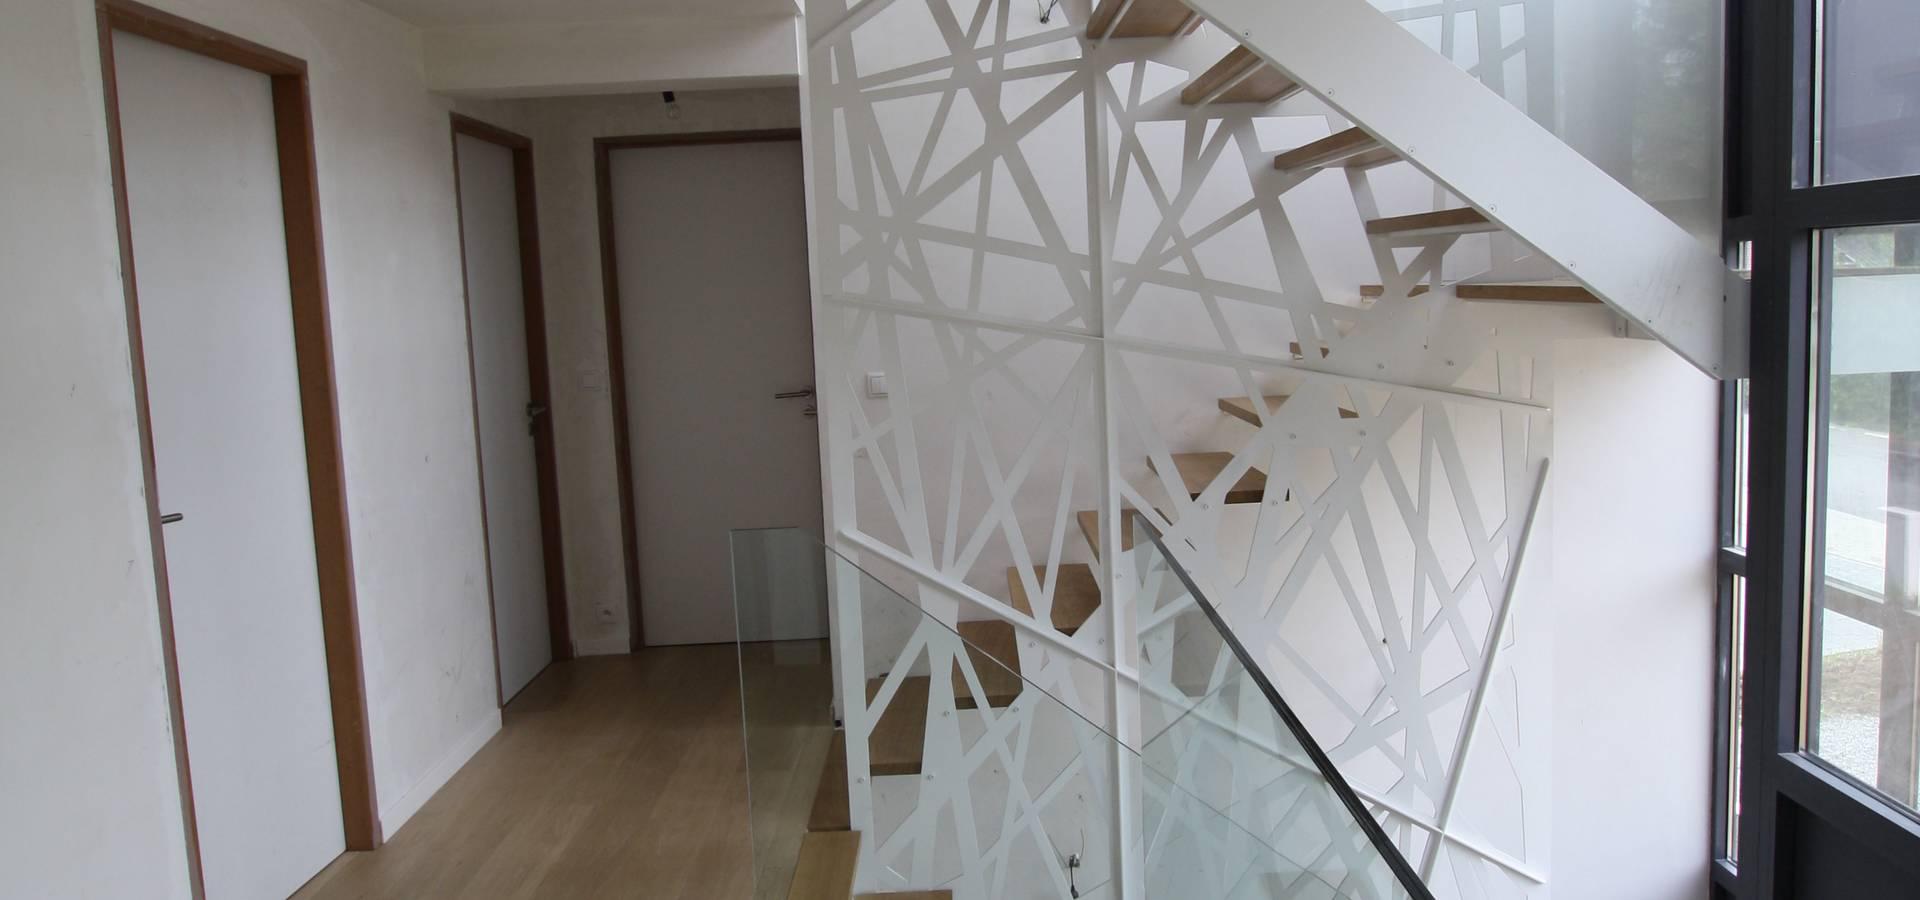 XVDH Architecture